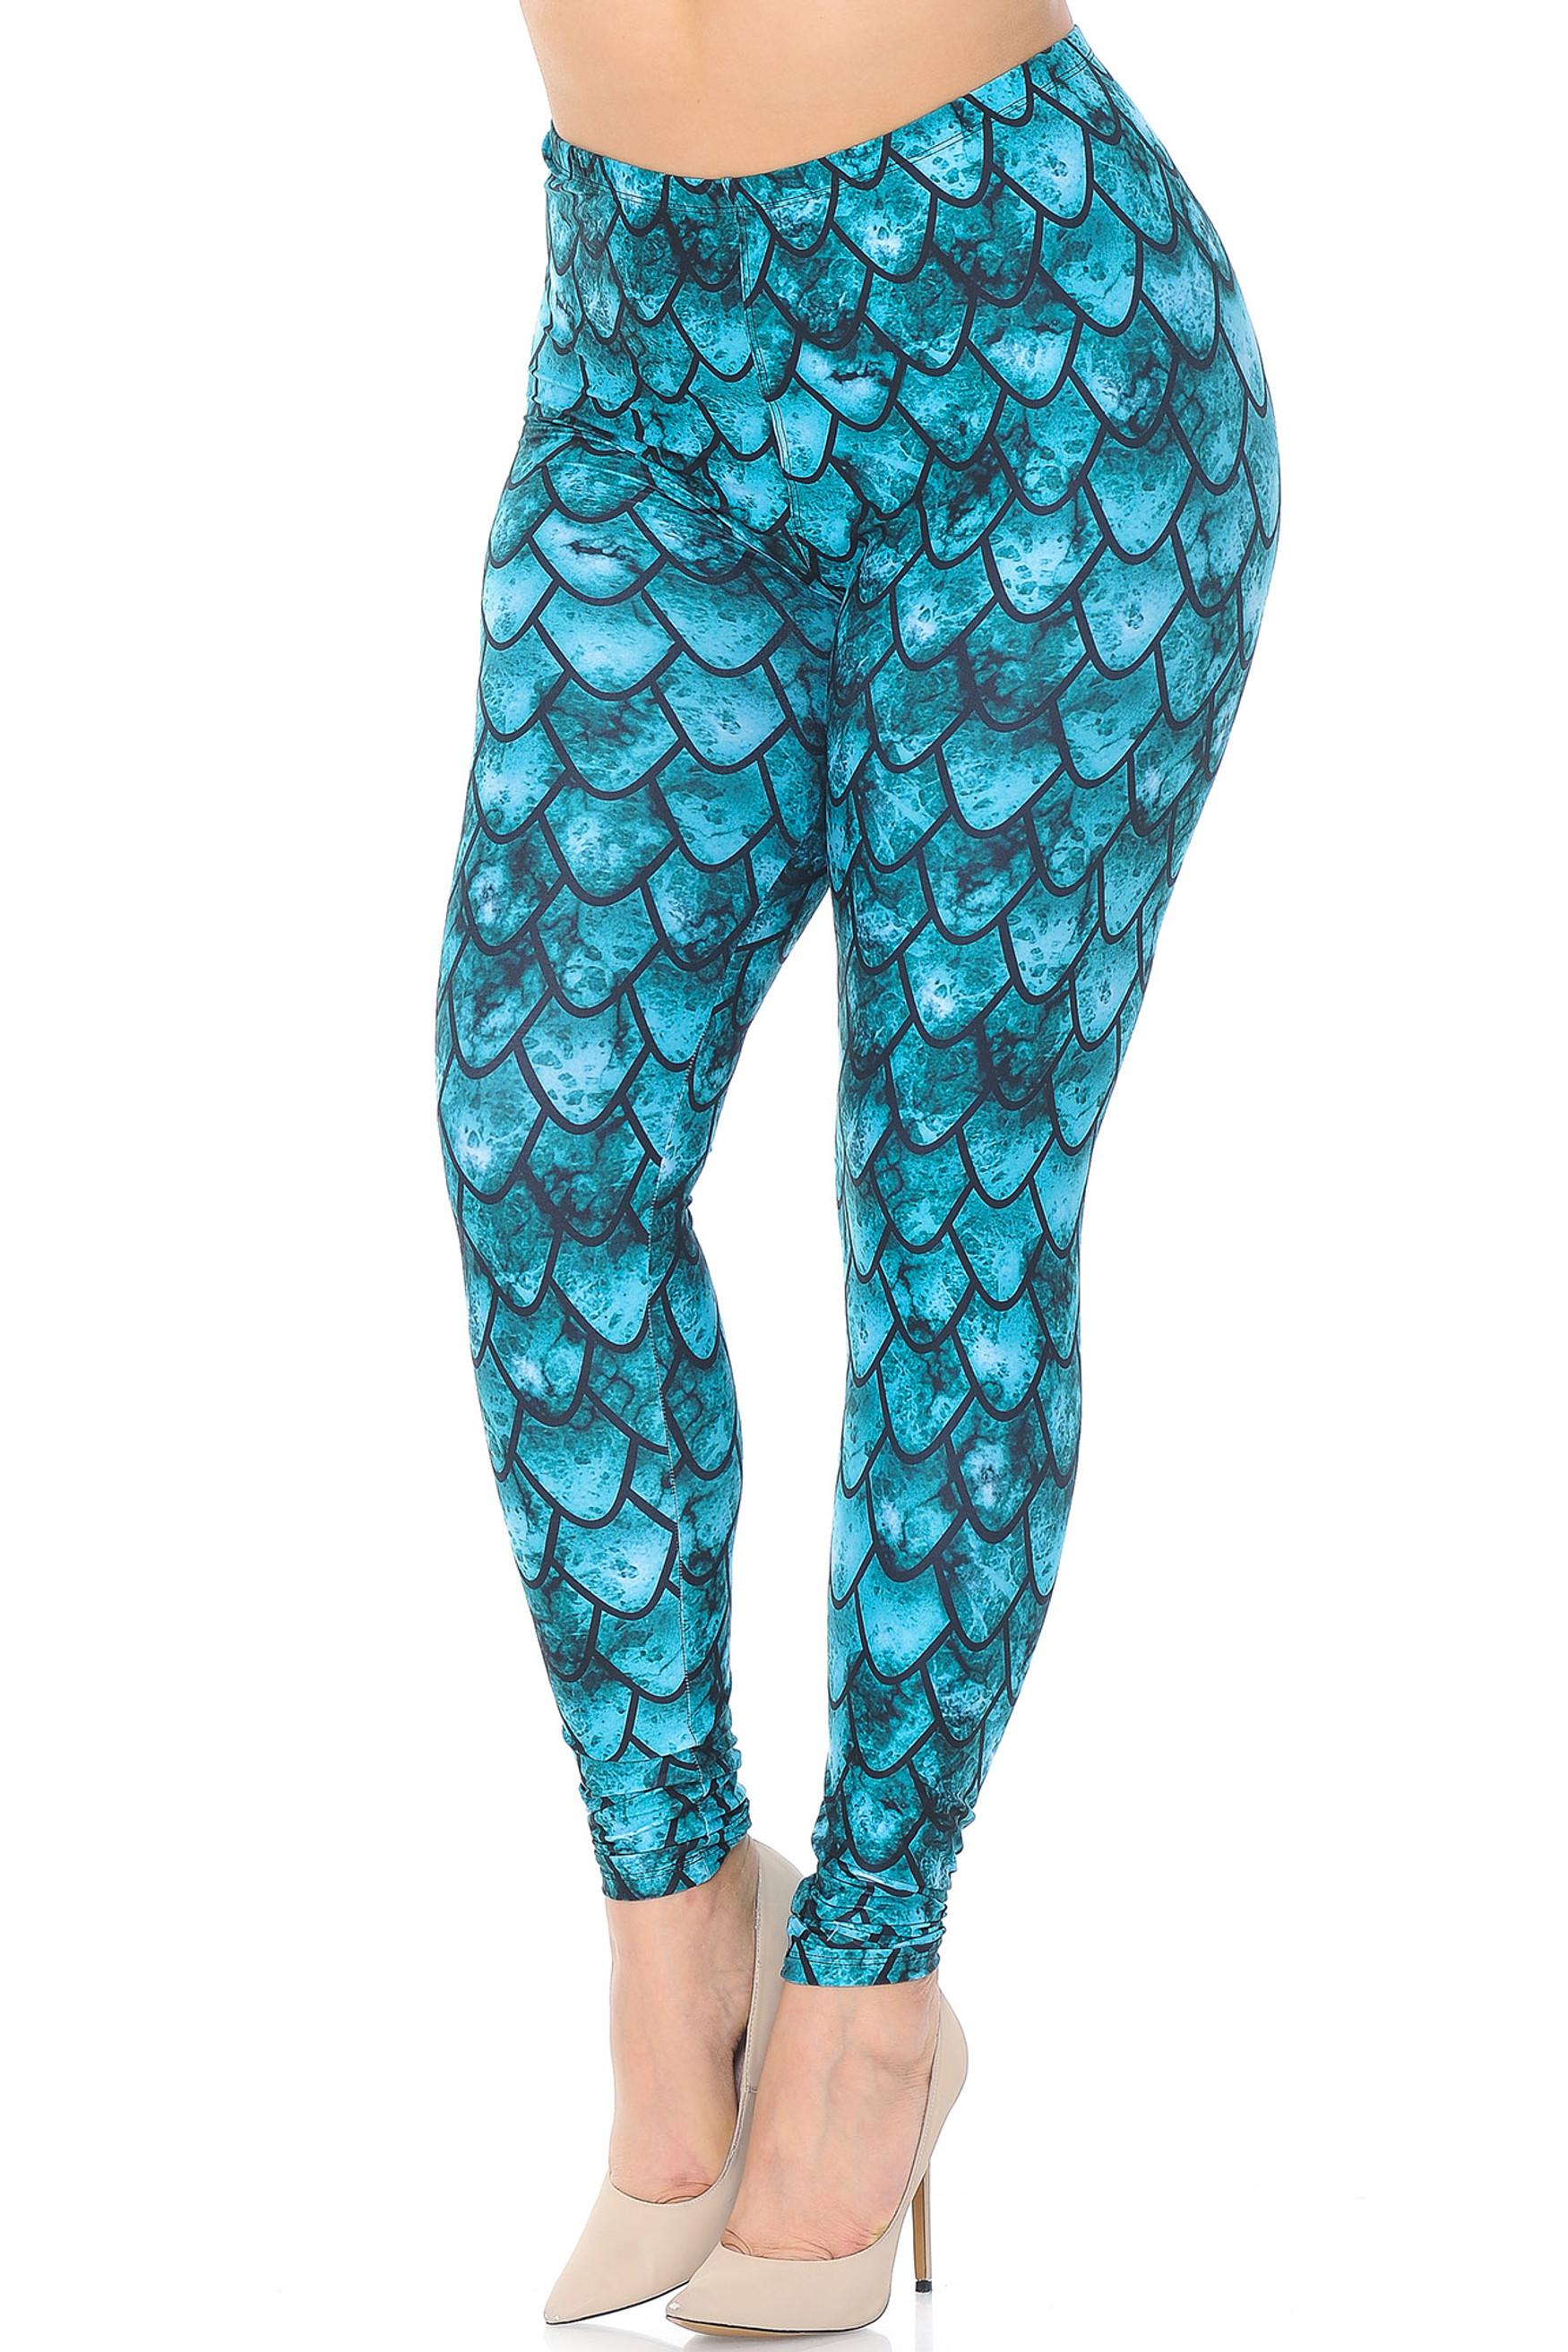 Creamy Soft Green Dragon Extra Plus Size Leggings - 3X-5X - USA Fashion™